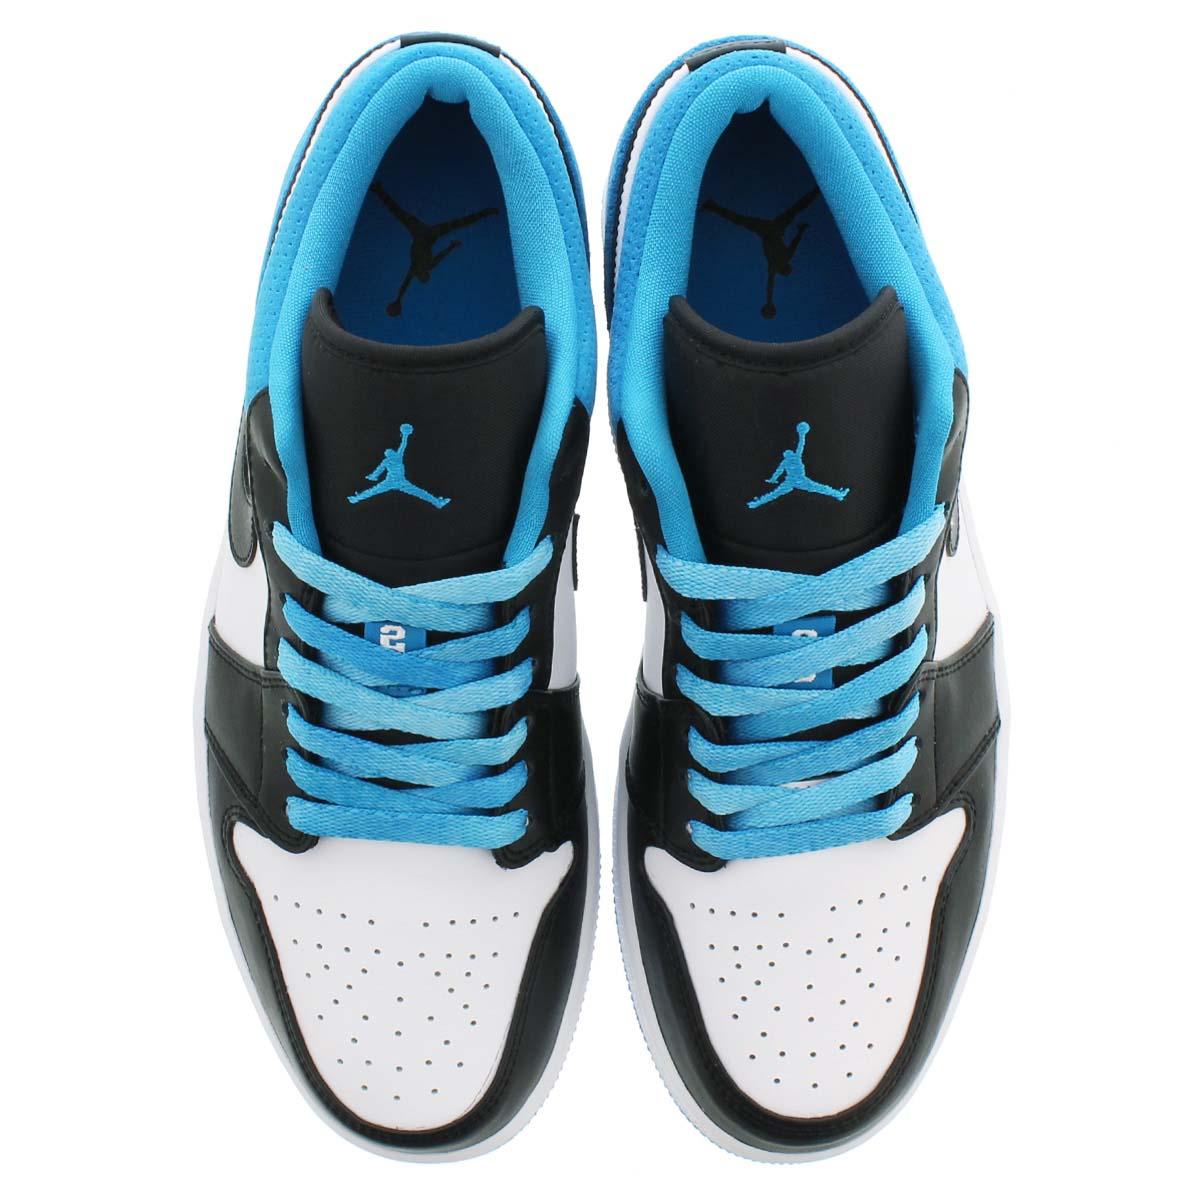 NIKE AIR JORDAN 1 LOW SE BLACK/BLACK-LASER BLUE-WHITE CK3022-004 ナイキ エアジョーダン1 ロー SE ブラック/ホワイト/ブルー